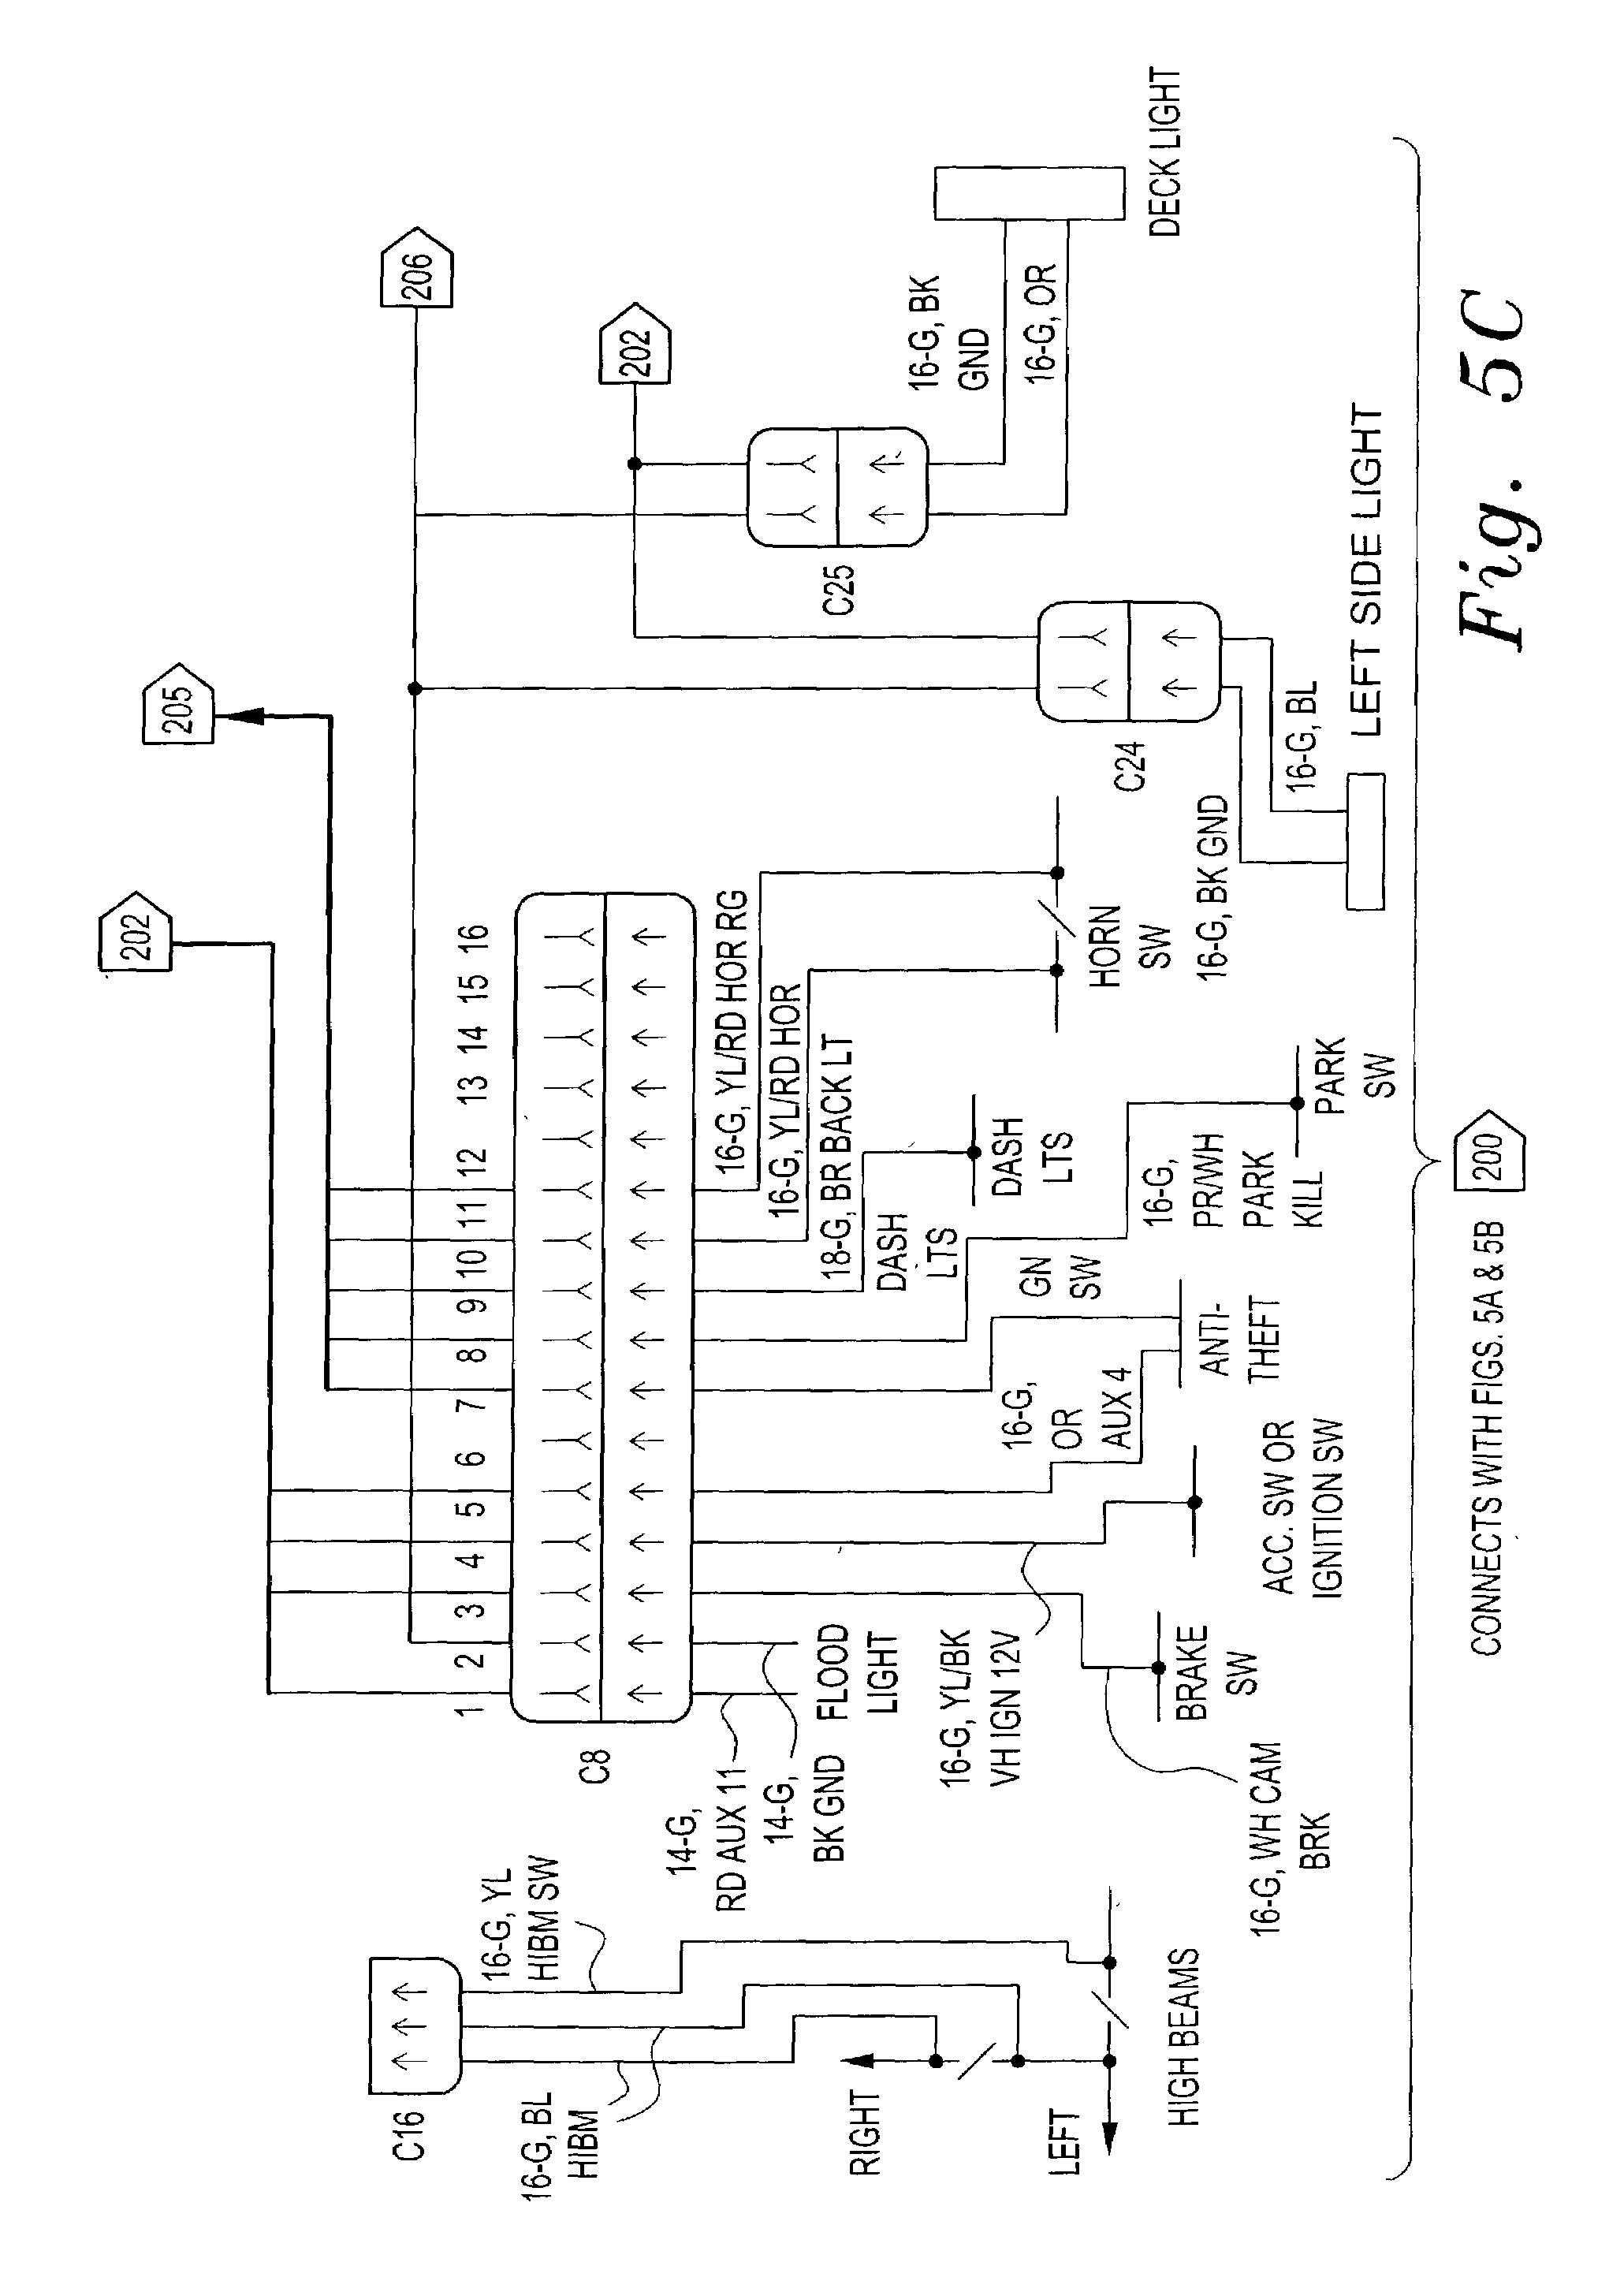 [NRIO_4796]   GB_9823] Co Light Bar Wiring Furthermore Code 3 Mx7000 Light Bar Wiring  Diagram Wiring Diagram | Led 200 Lights Wiring Diagram |  | Elec Gritea Mohammedshrine Librar Wiring 101